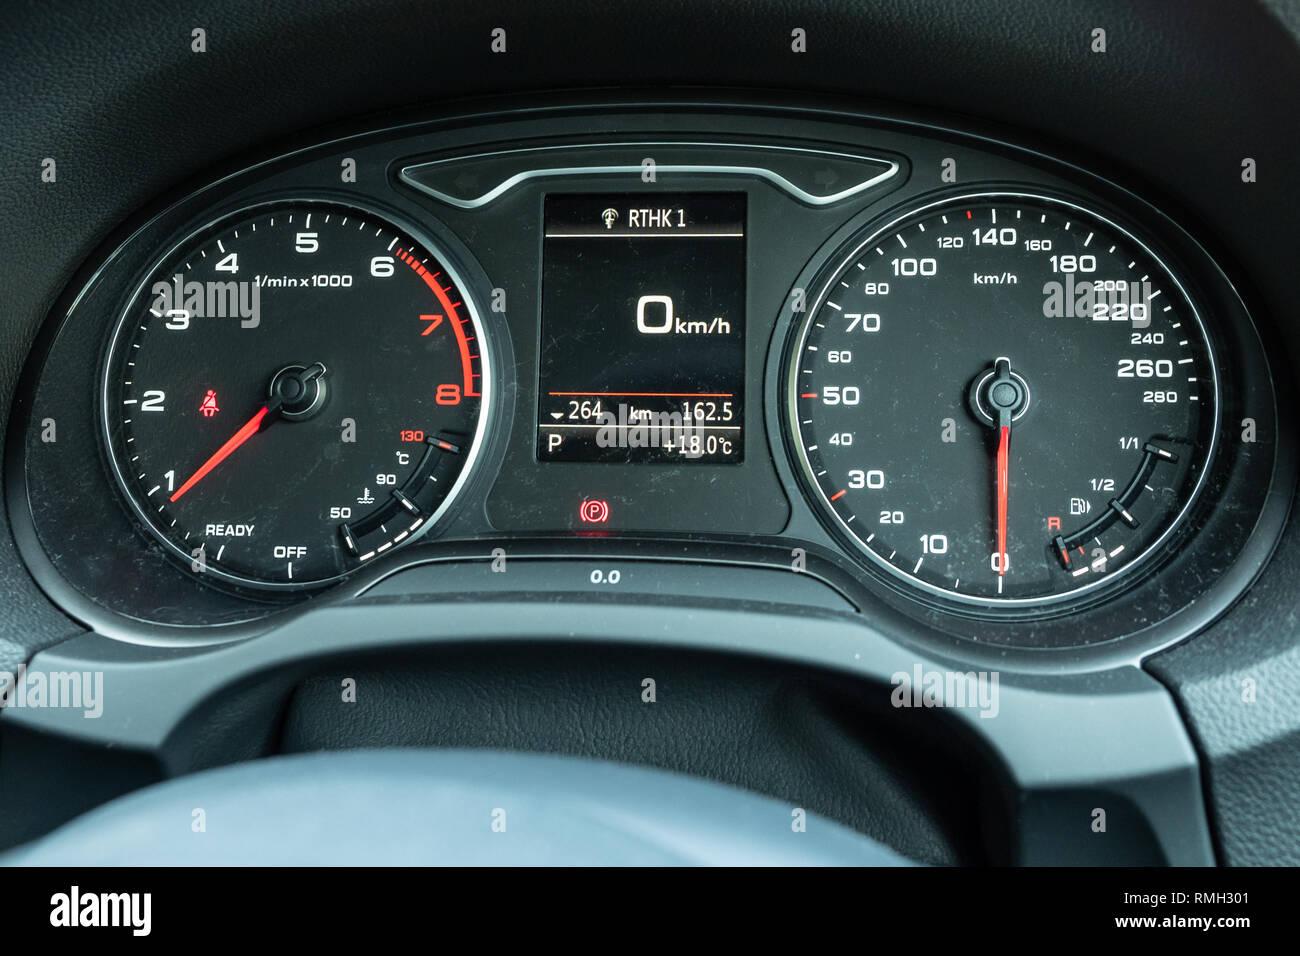 Hong Kong China Jan 23 2019 Audi A3 Sportback 2019 Dashboard Jan 23 2019 In Hong Kong Stock Photo Alamy